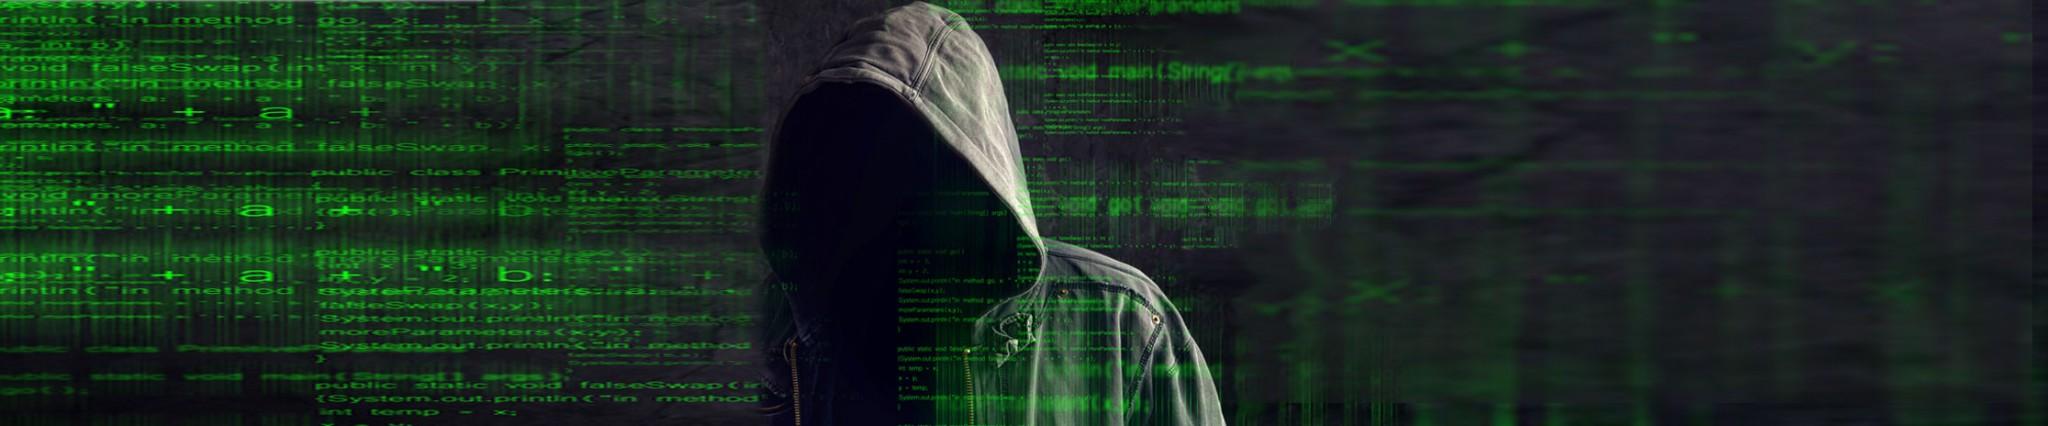 Rezension Cybergefahr